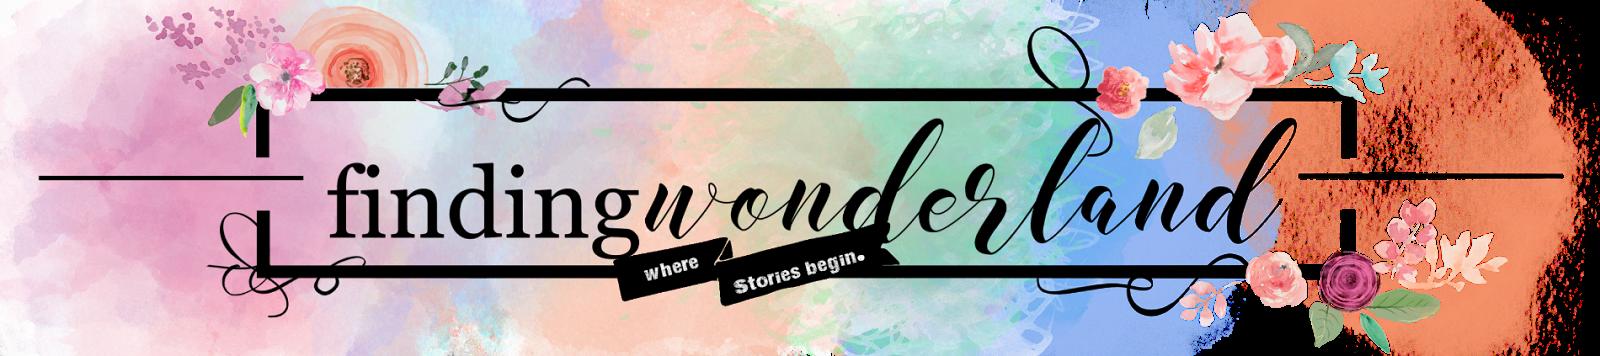 Finding Wonderland   Where Stories Begin